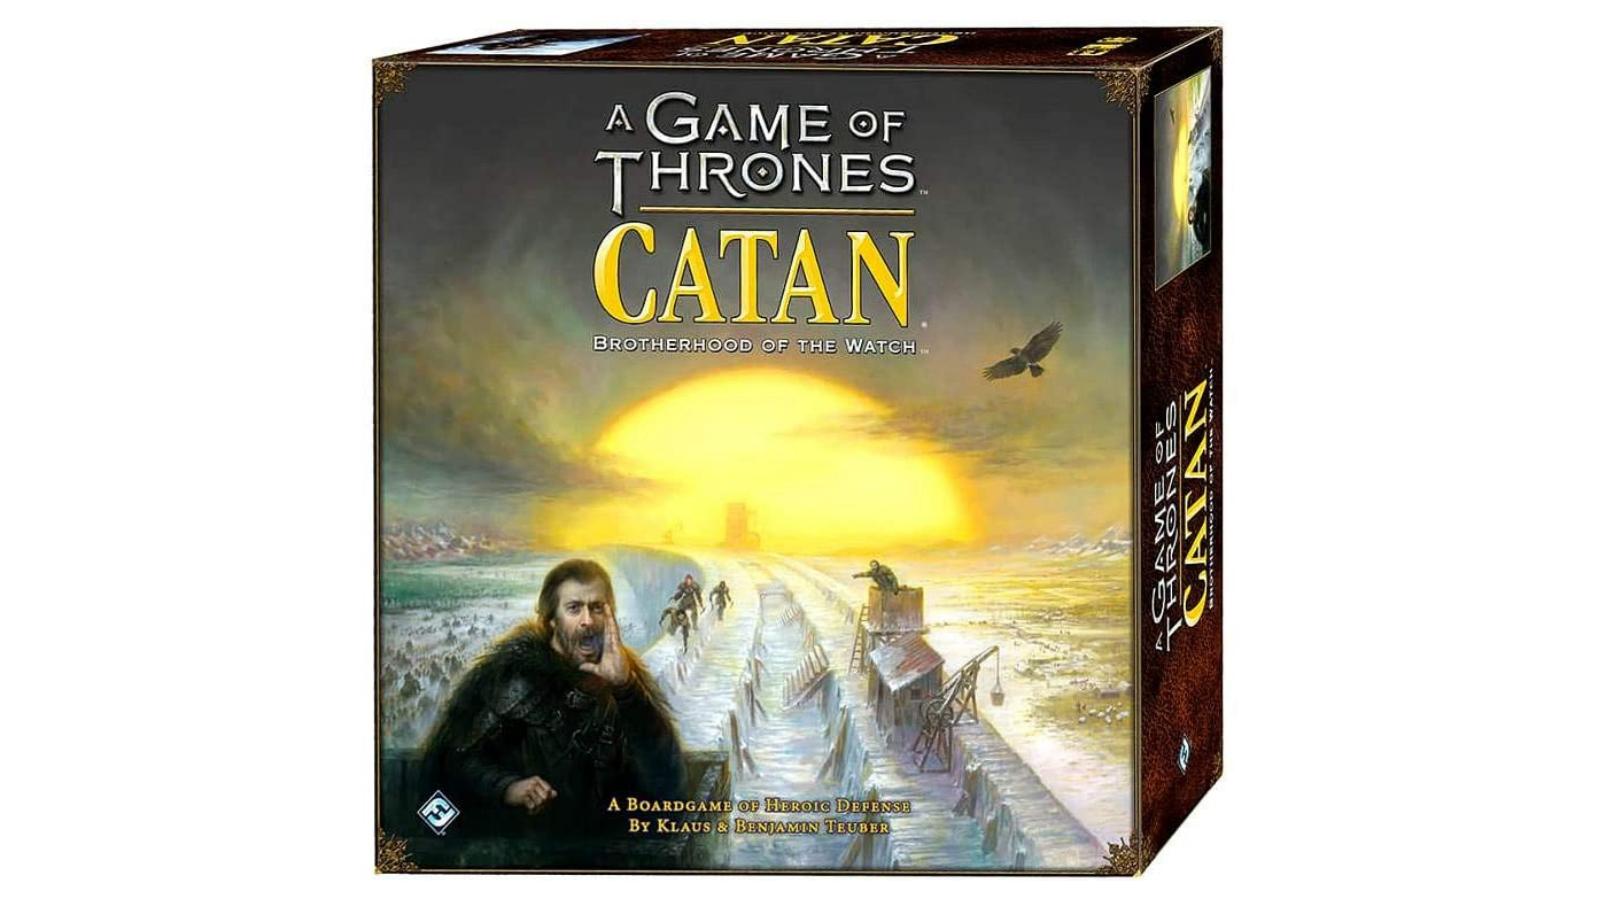 A Game of Thrones CATAN deal